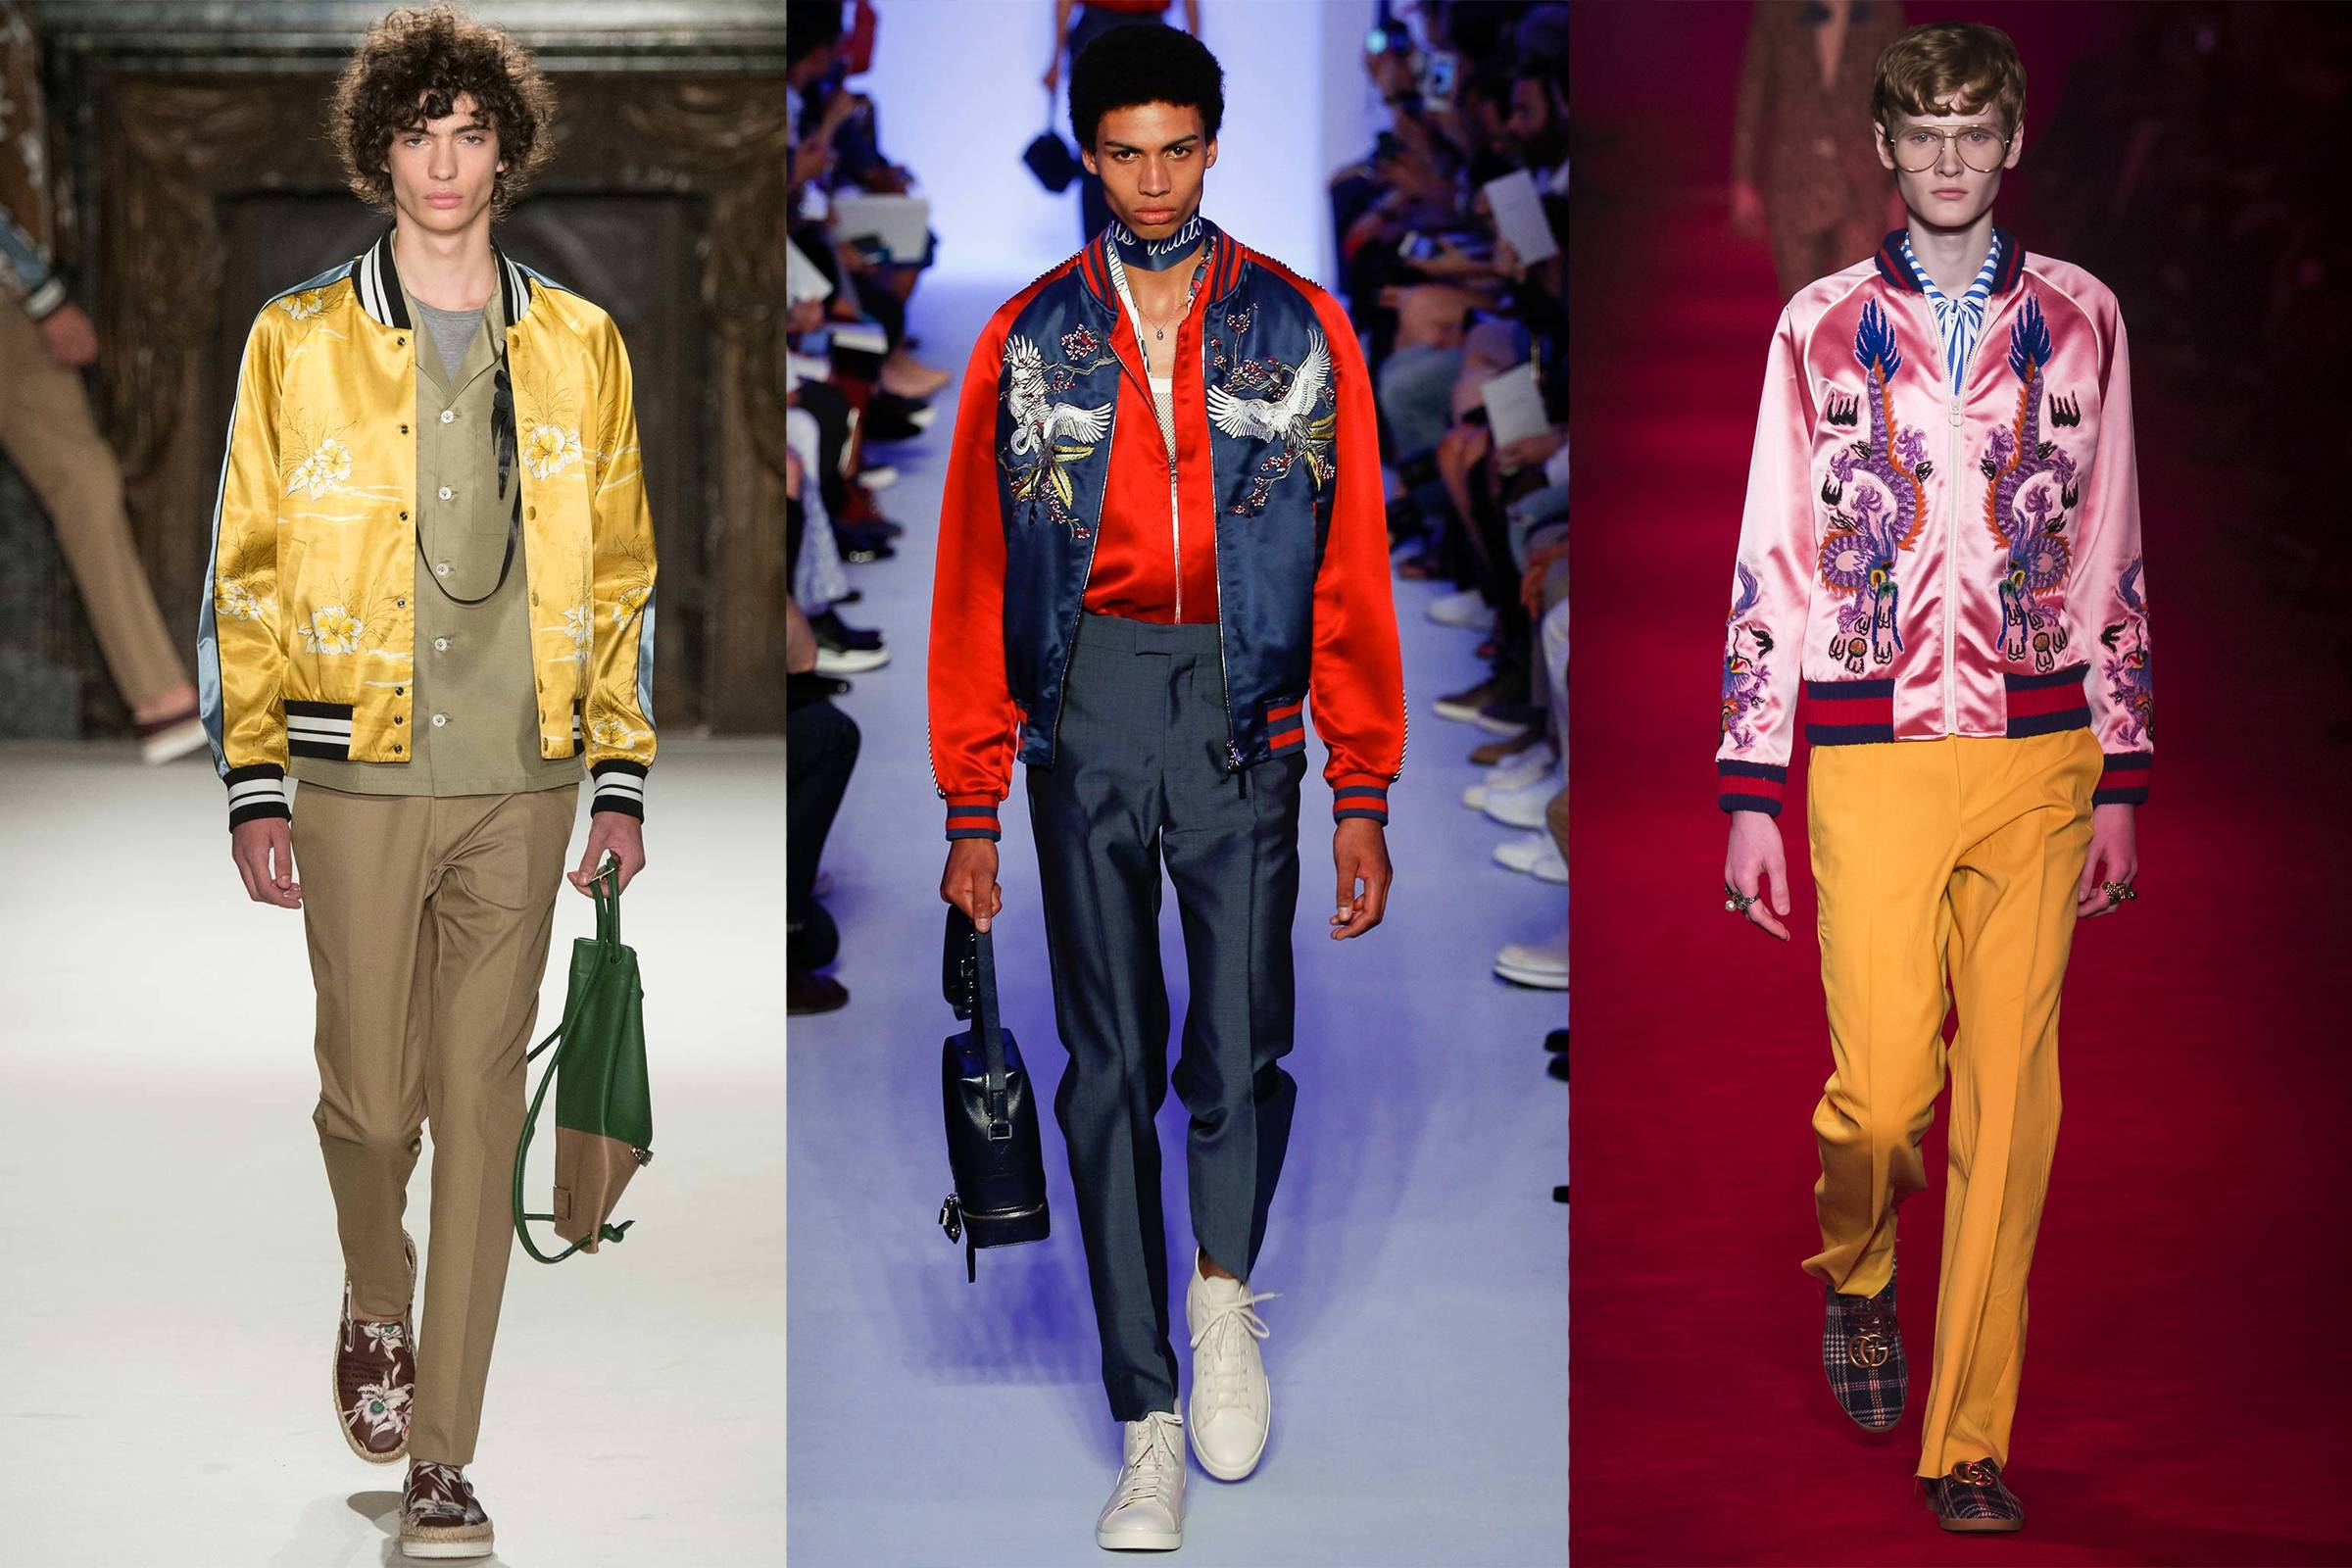 Слева направо: мужская коллекция Valentino Весна/Лето 2016, мужская коллекция Louis Vuitton Весна/Лето 2016 и мужская коллекция Gucci Осень 2016